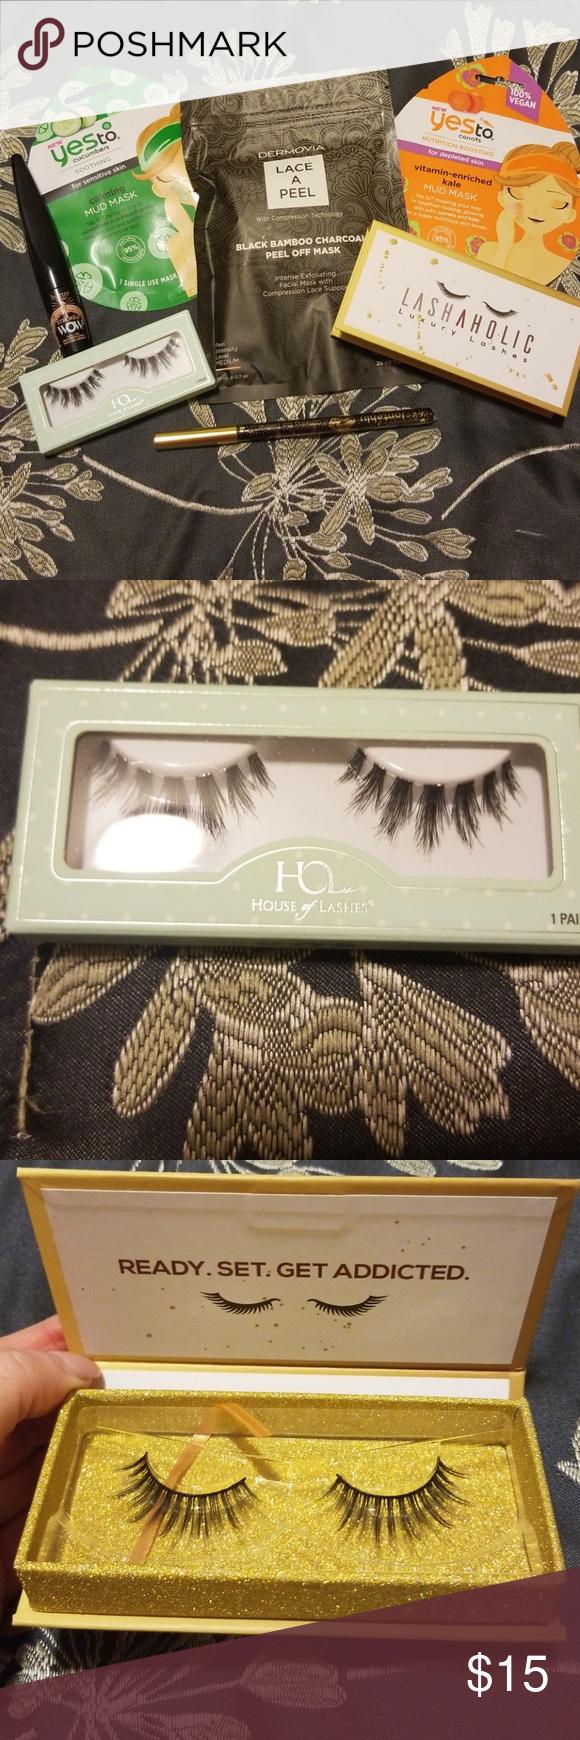 56c741ac7e2 Makeup Bundle💄 Brand New unused makeup bundle!!🖤💄 1 pair Lashaholic  luxury